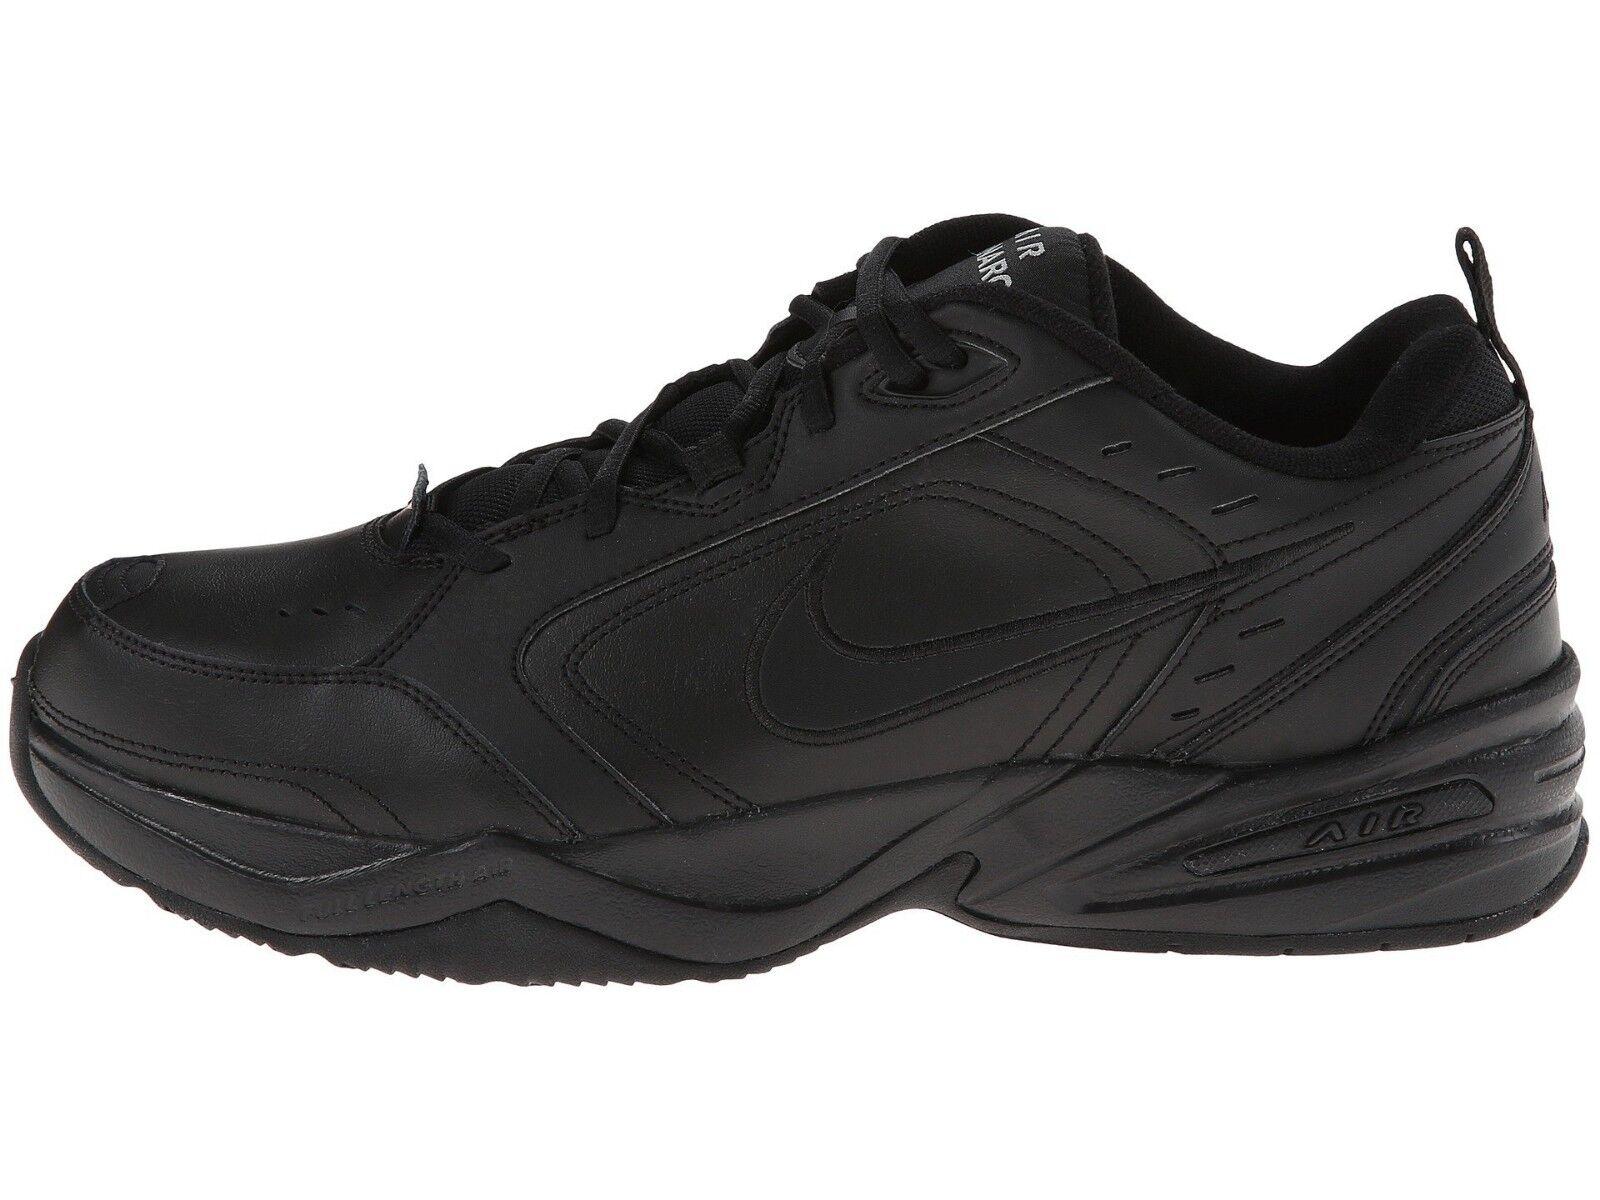 Nike Men's Air Monarch IV Training shoes (415445 001) Black Sizes 8.5-13 Medium W